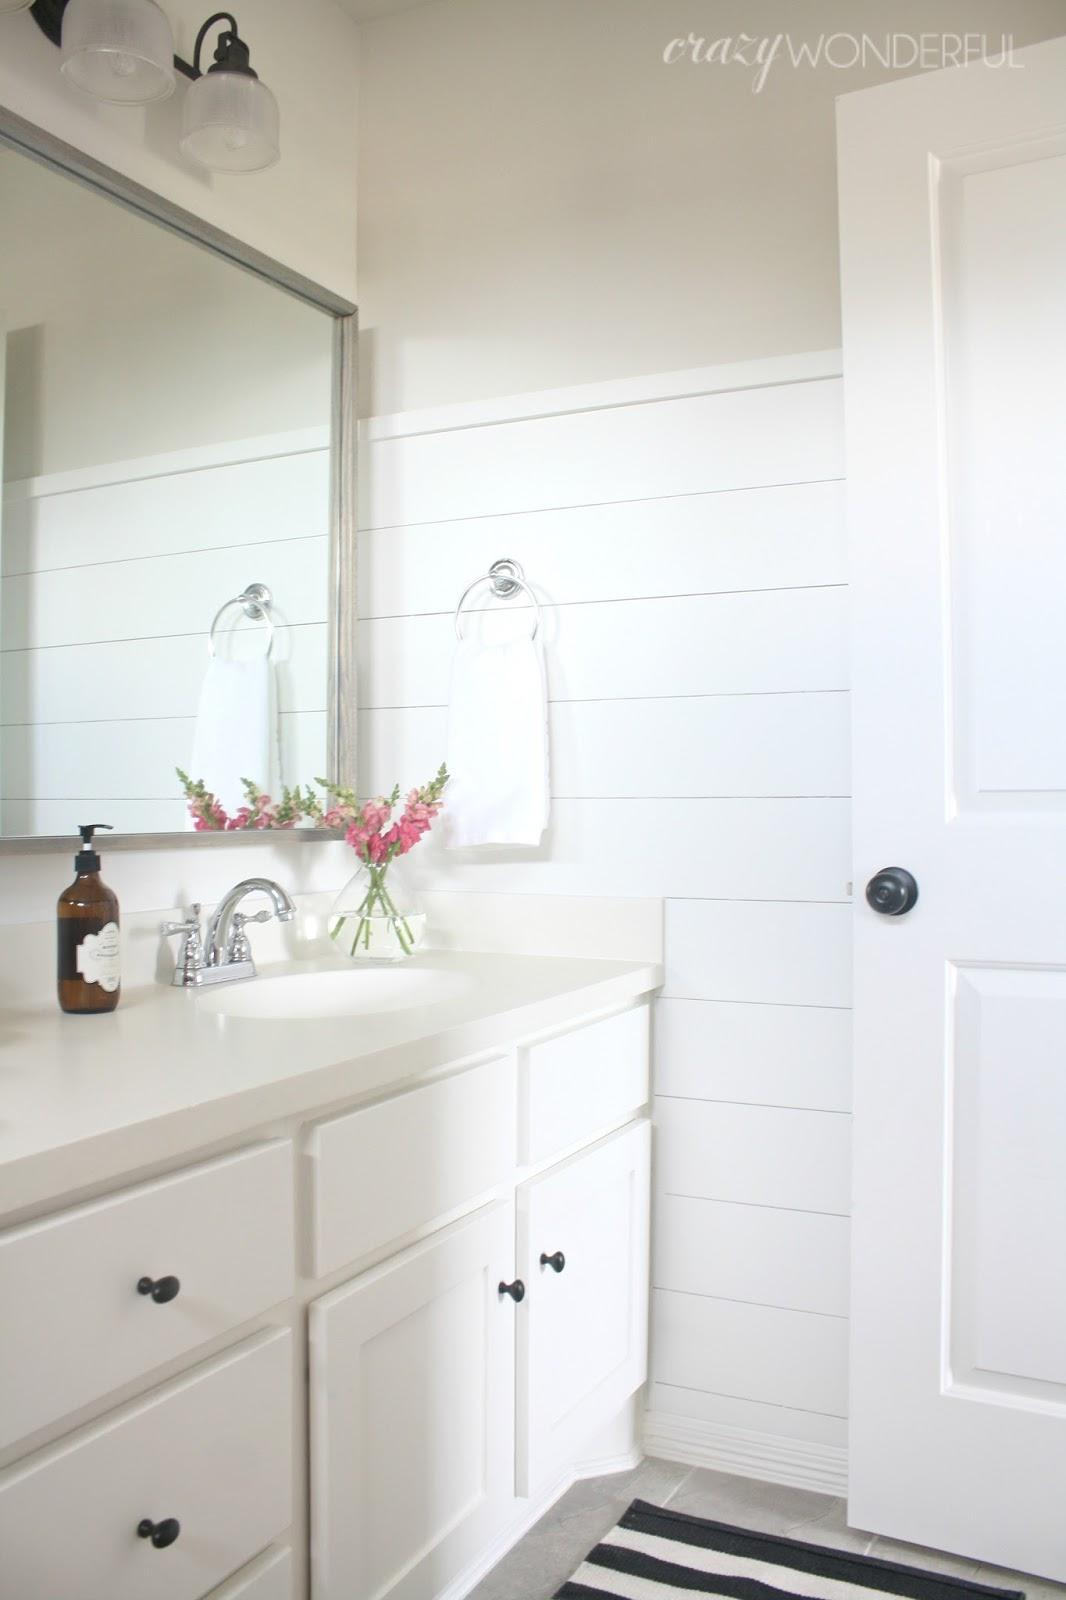 Crazy wonderful shiplap girl 39 s bathroom reveal for Bathroom ideas with shiplap